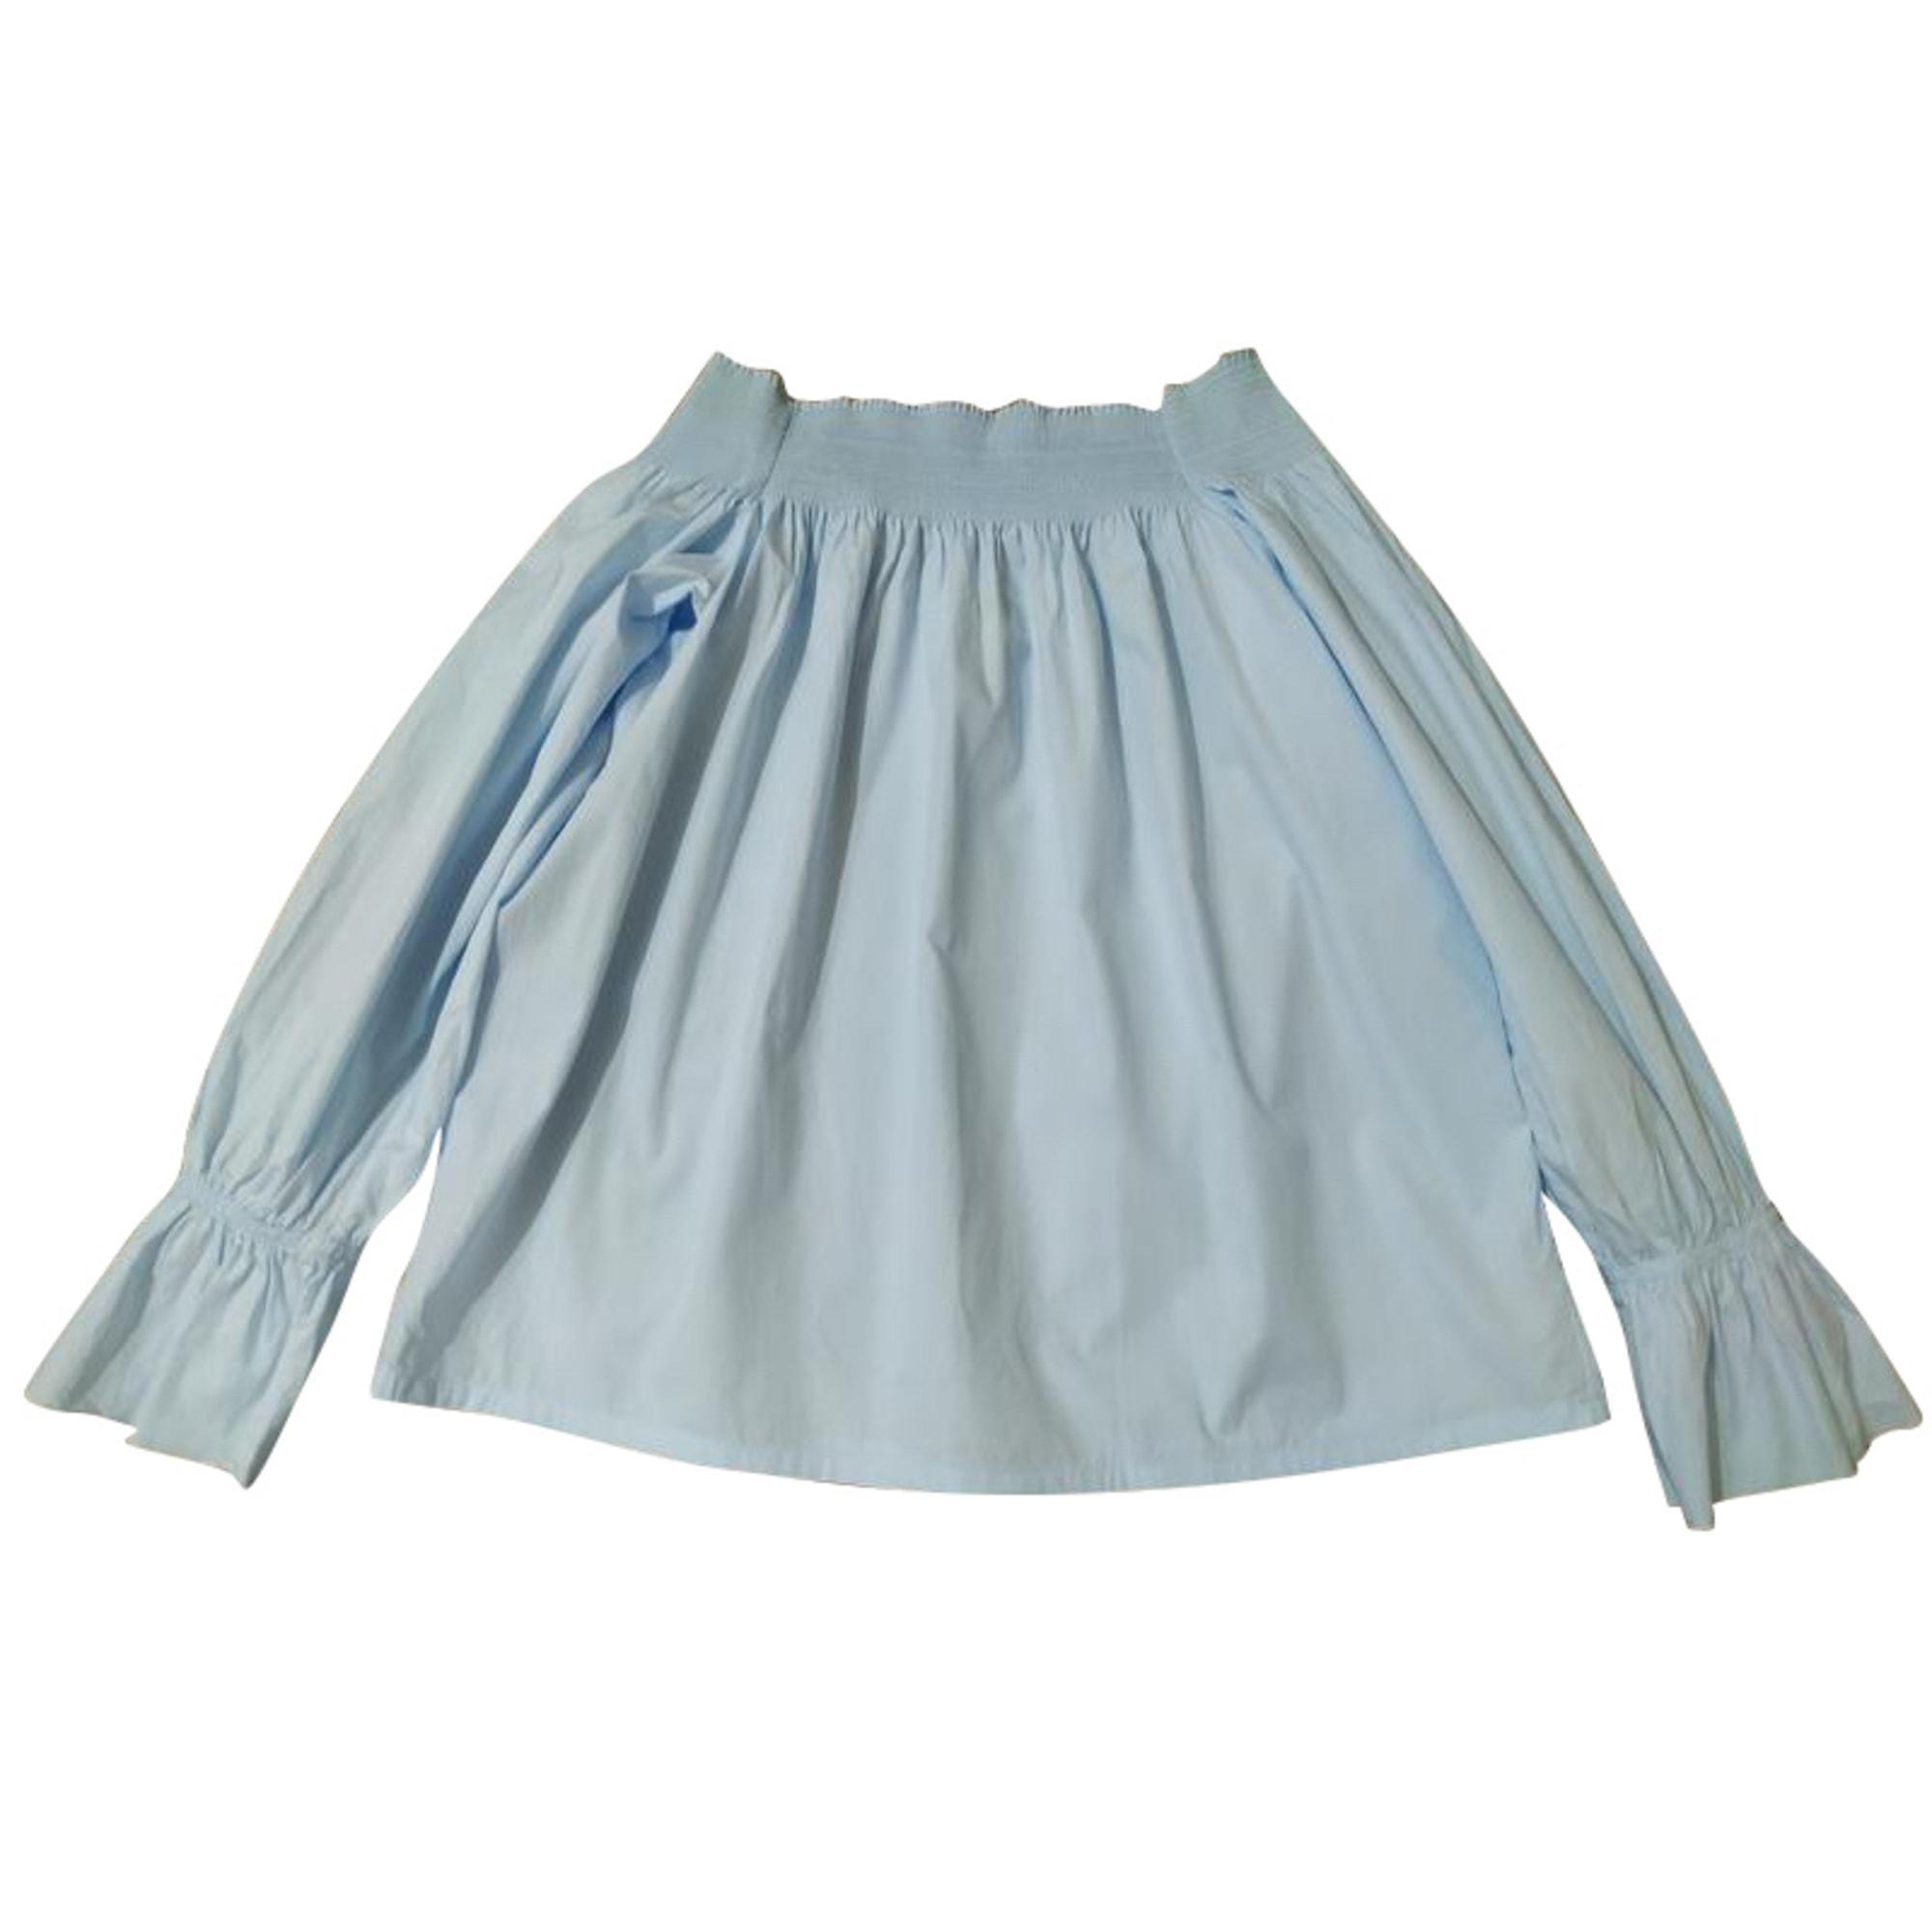 Tunique MM6 MAISON MARTIN MARGIELA Bleu, bleu marine, bleu turquoise